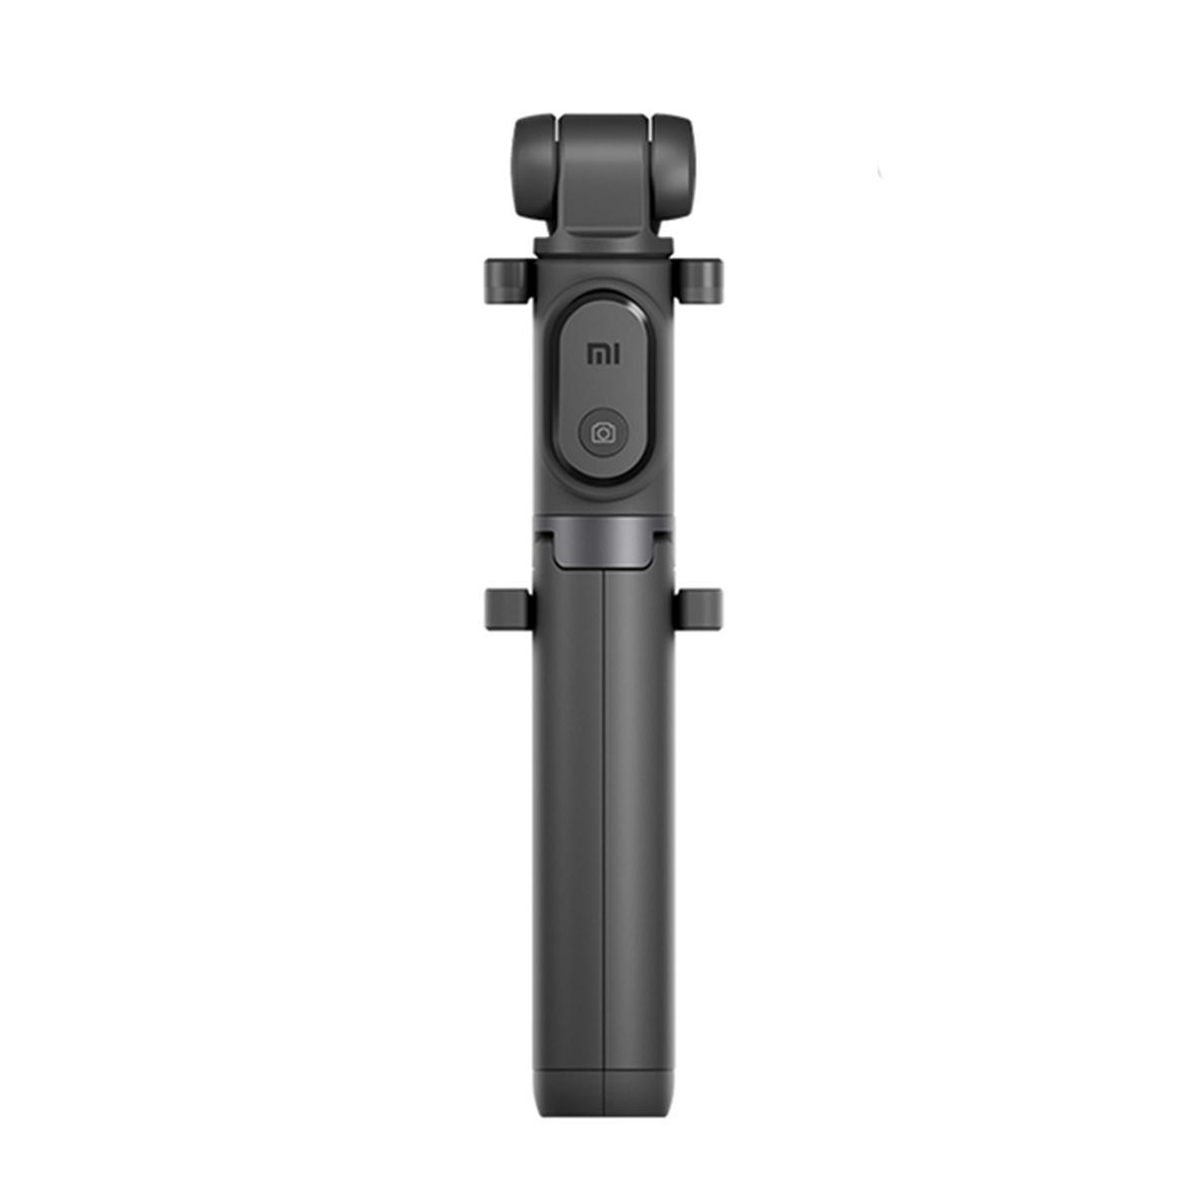 Mi Bluetooth Selfie Stick With Tripod - Black